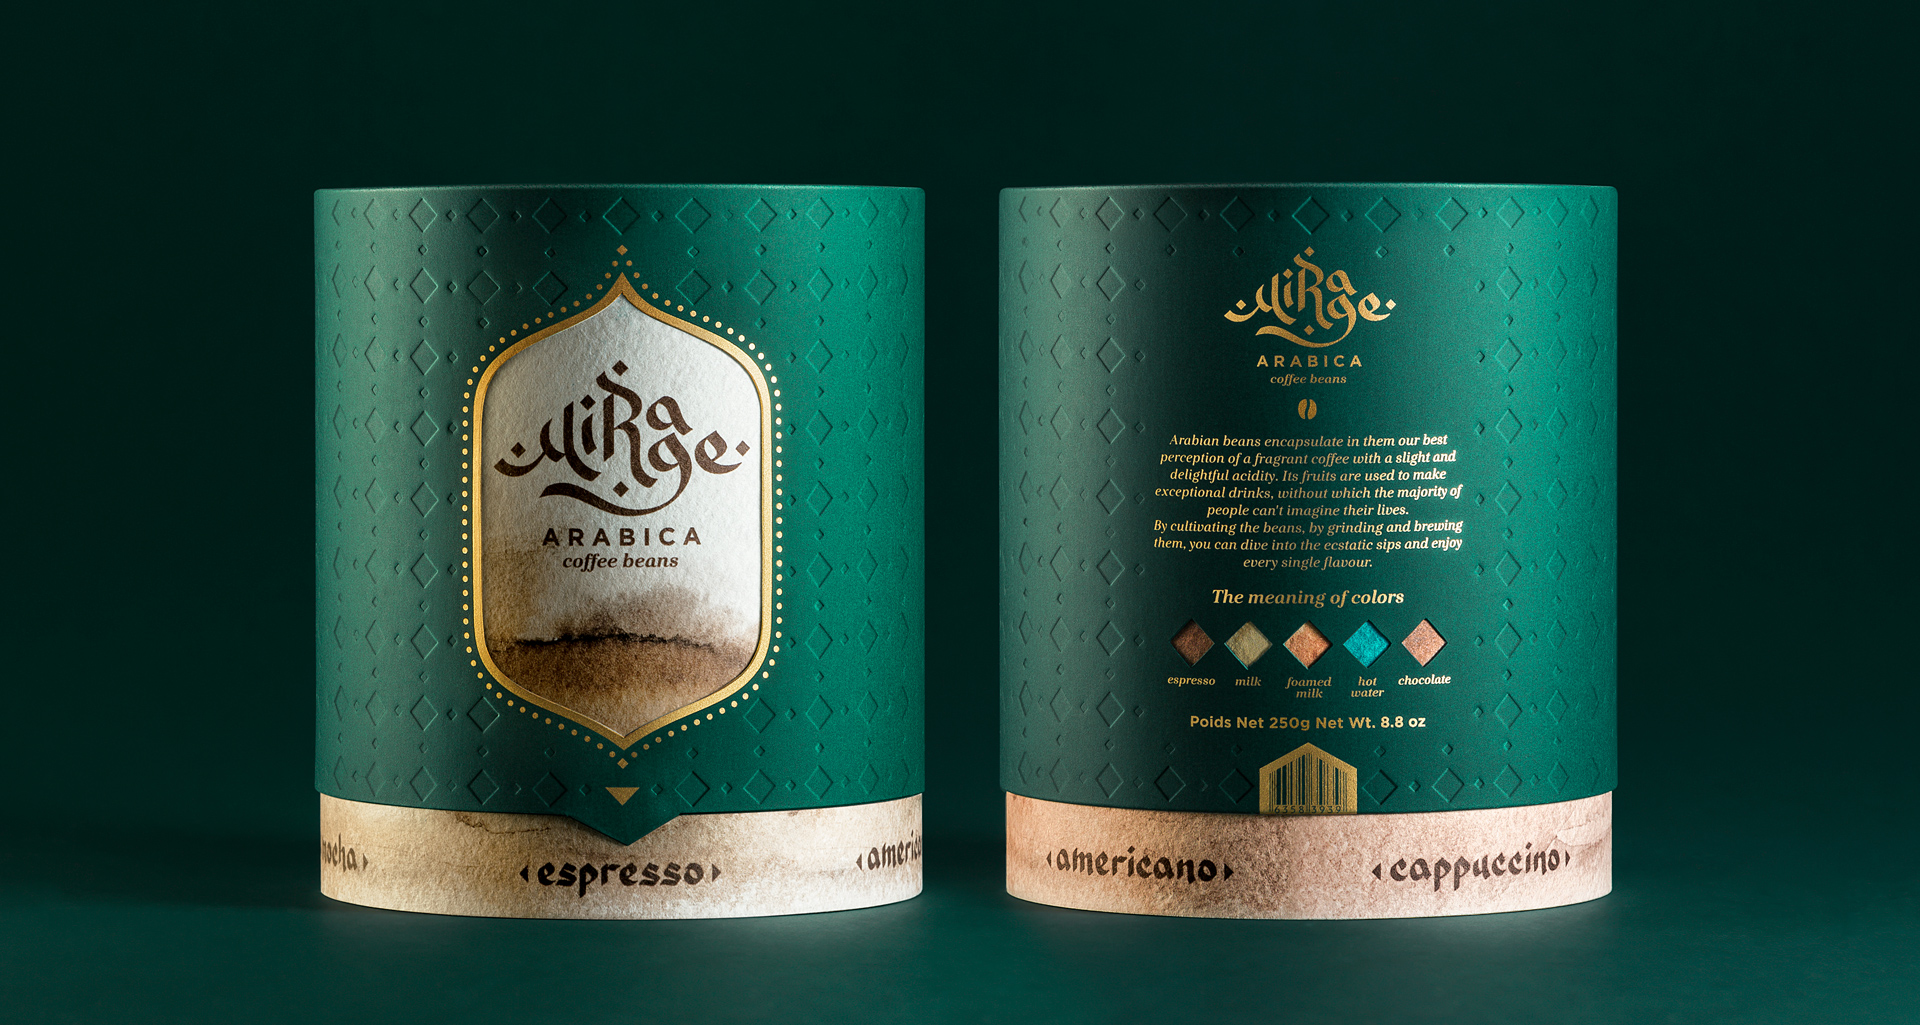 Mirage Arabica Coffee 2.jpg